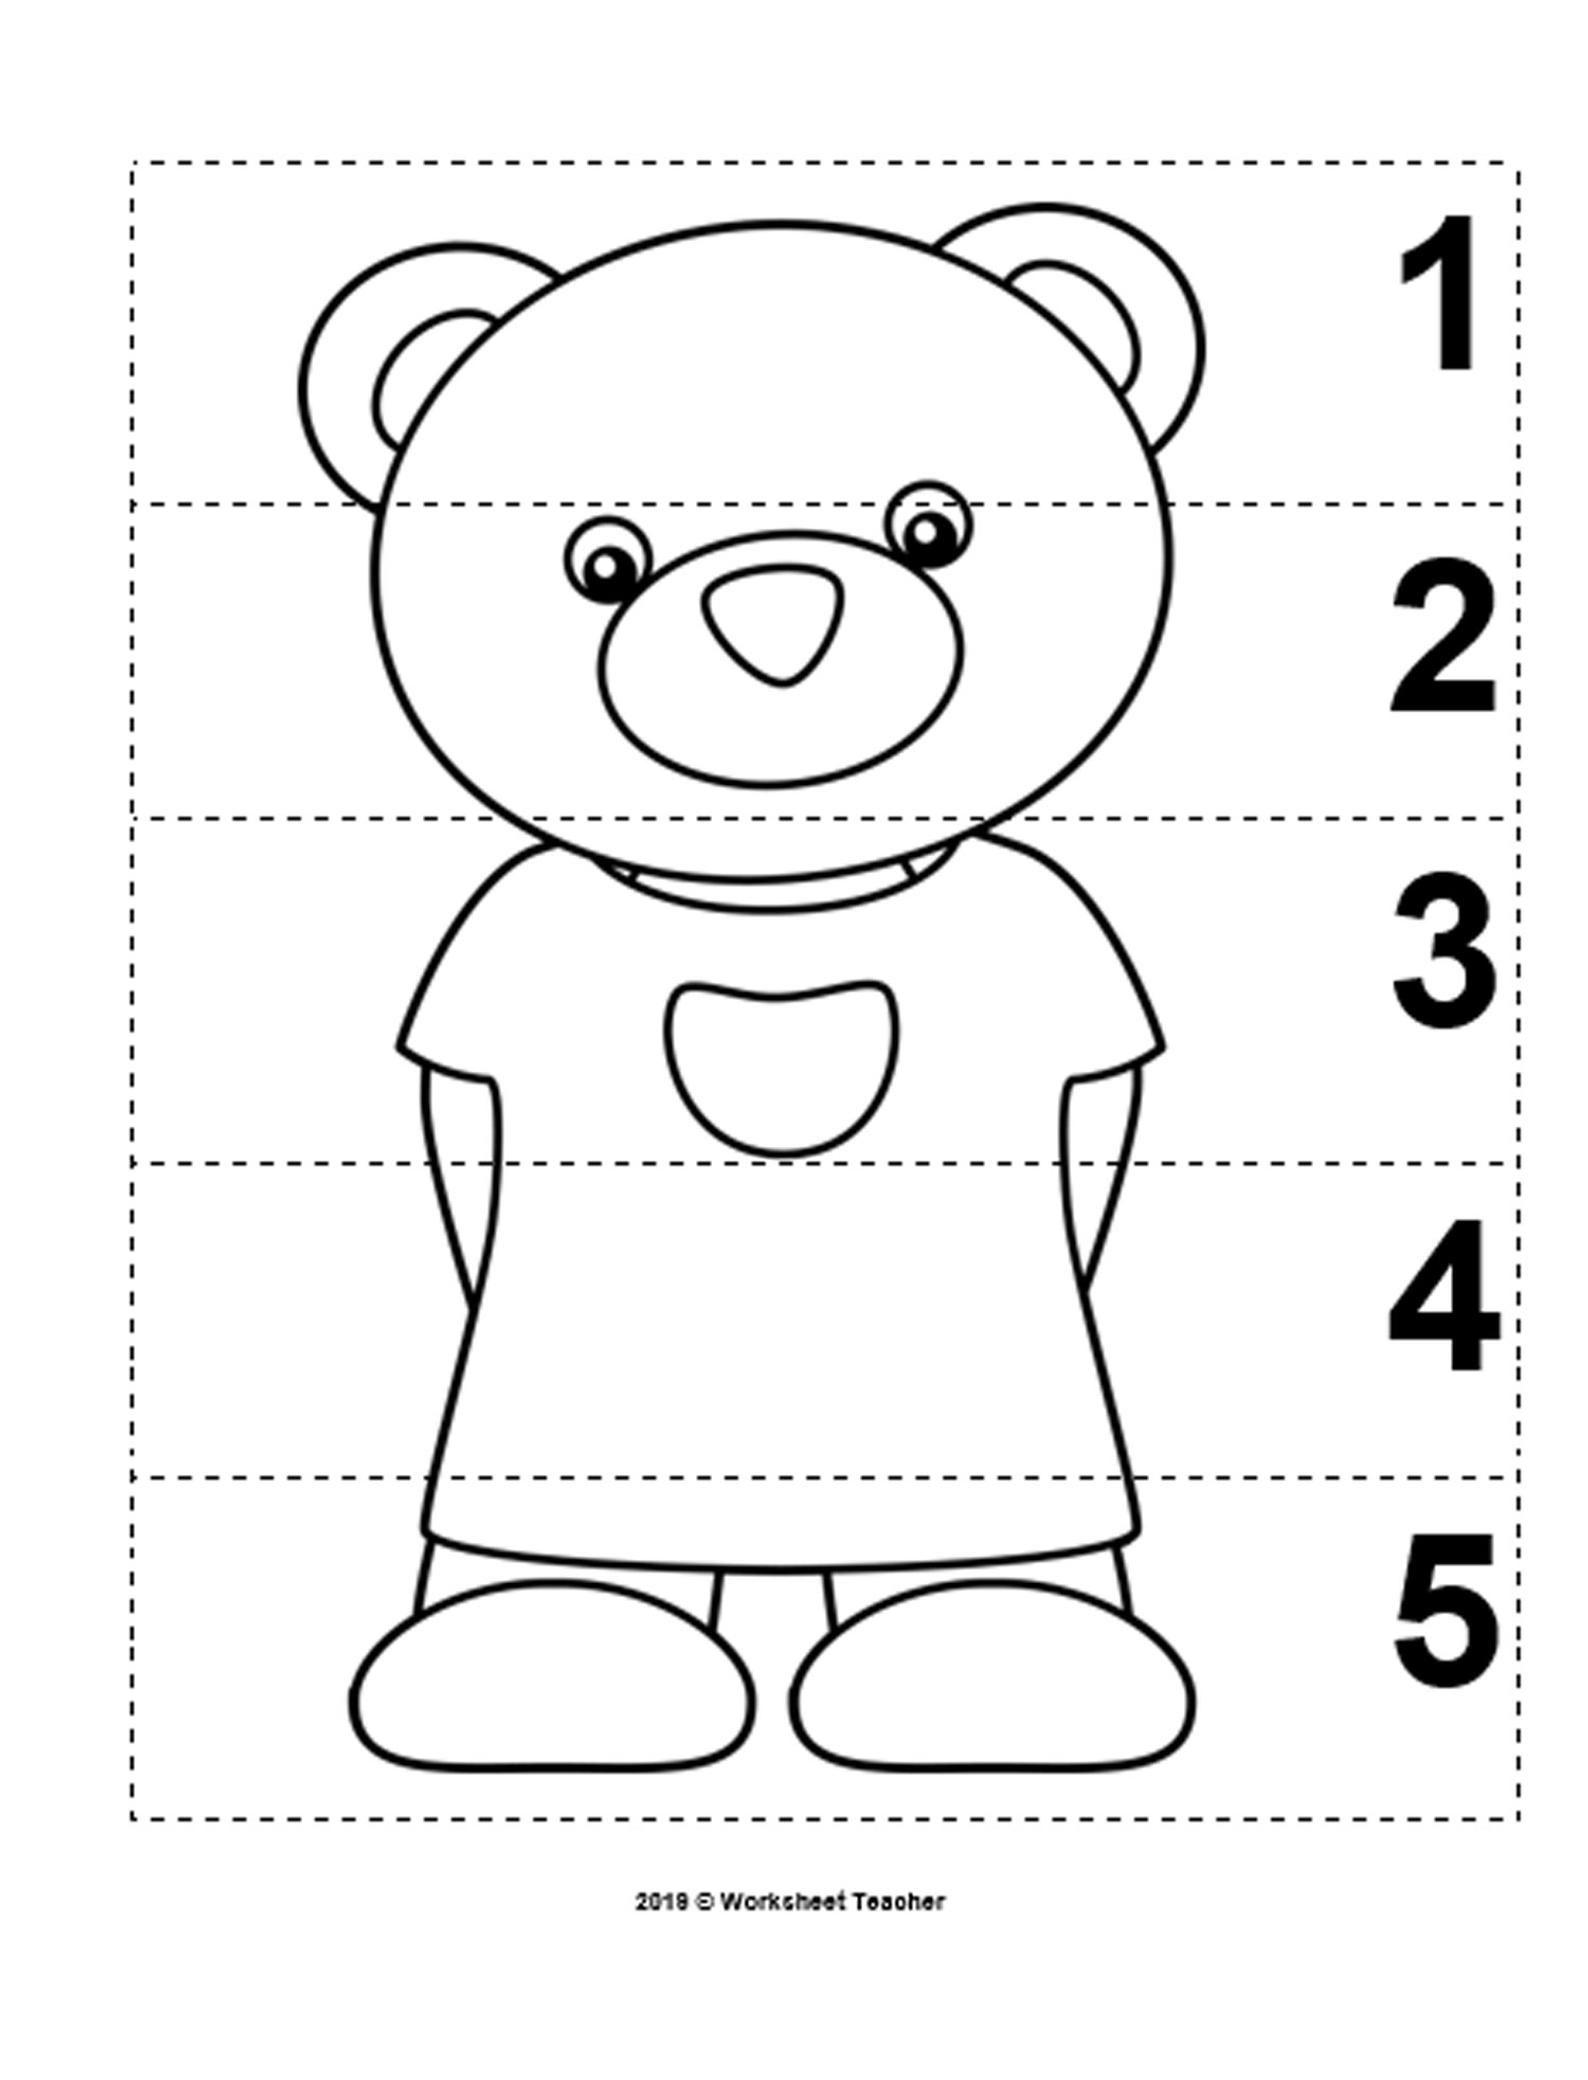 10 Goldilocks And The Three Bears Preschool Curriculum